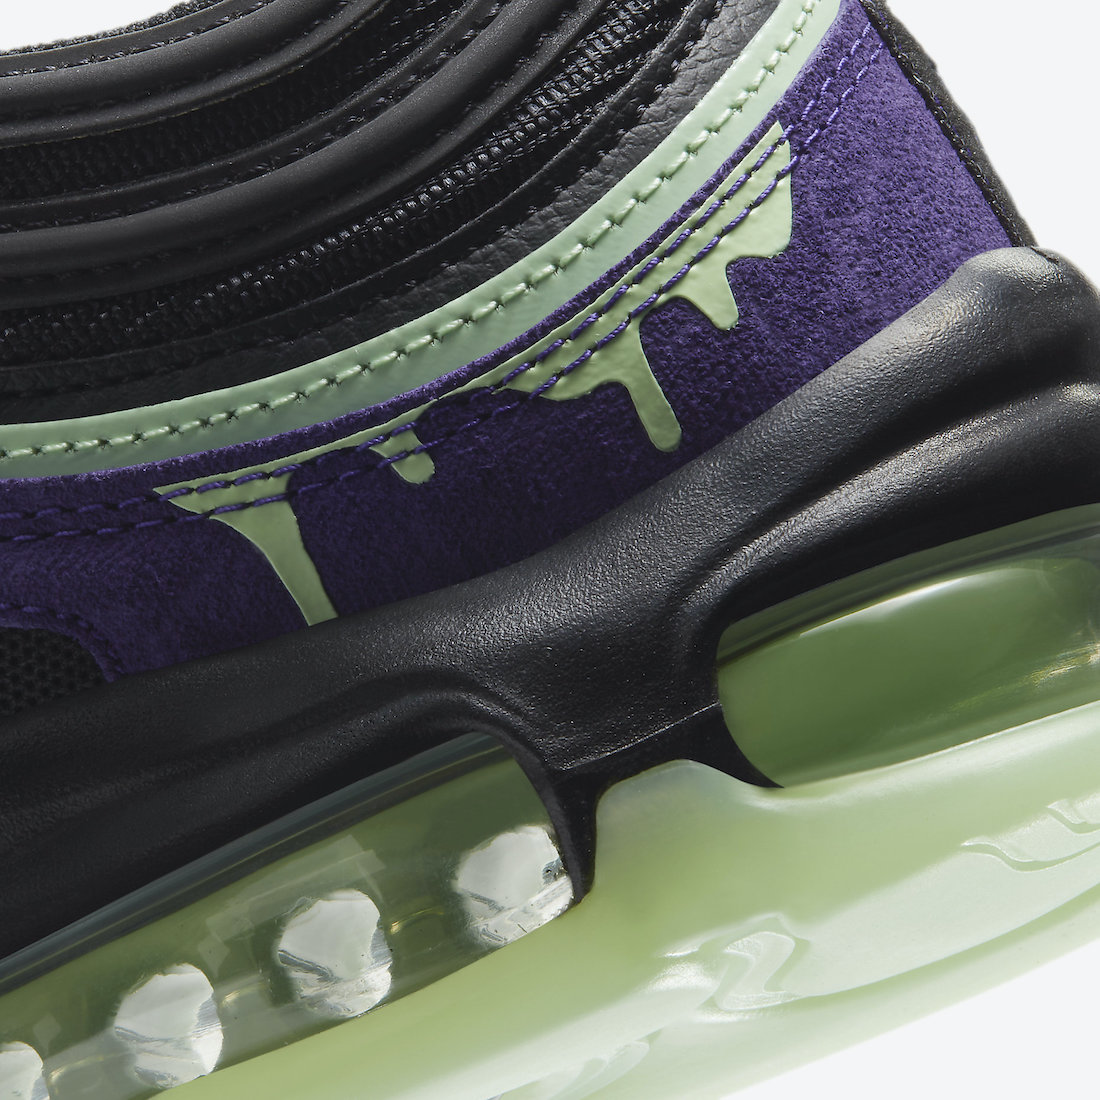 Nike-Air-Max-97-Slime-Halloween-DC1500-001-Release-Date-7